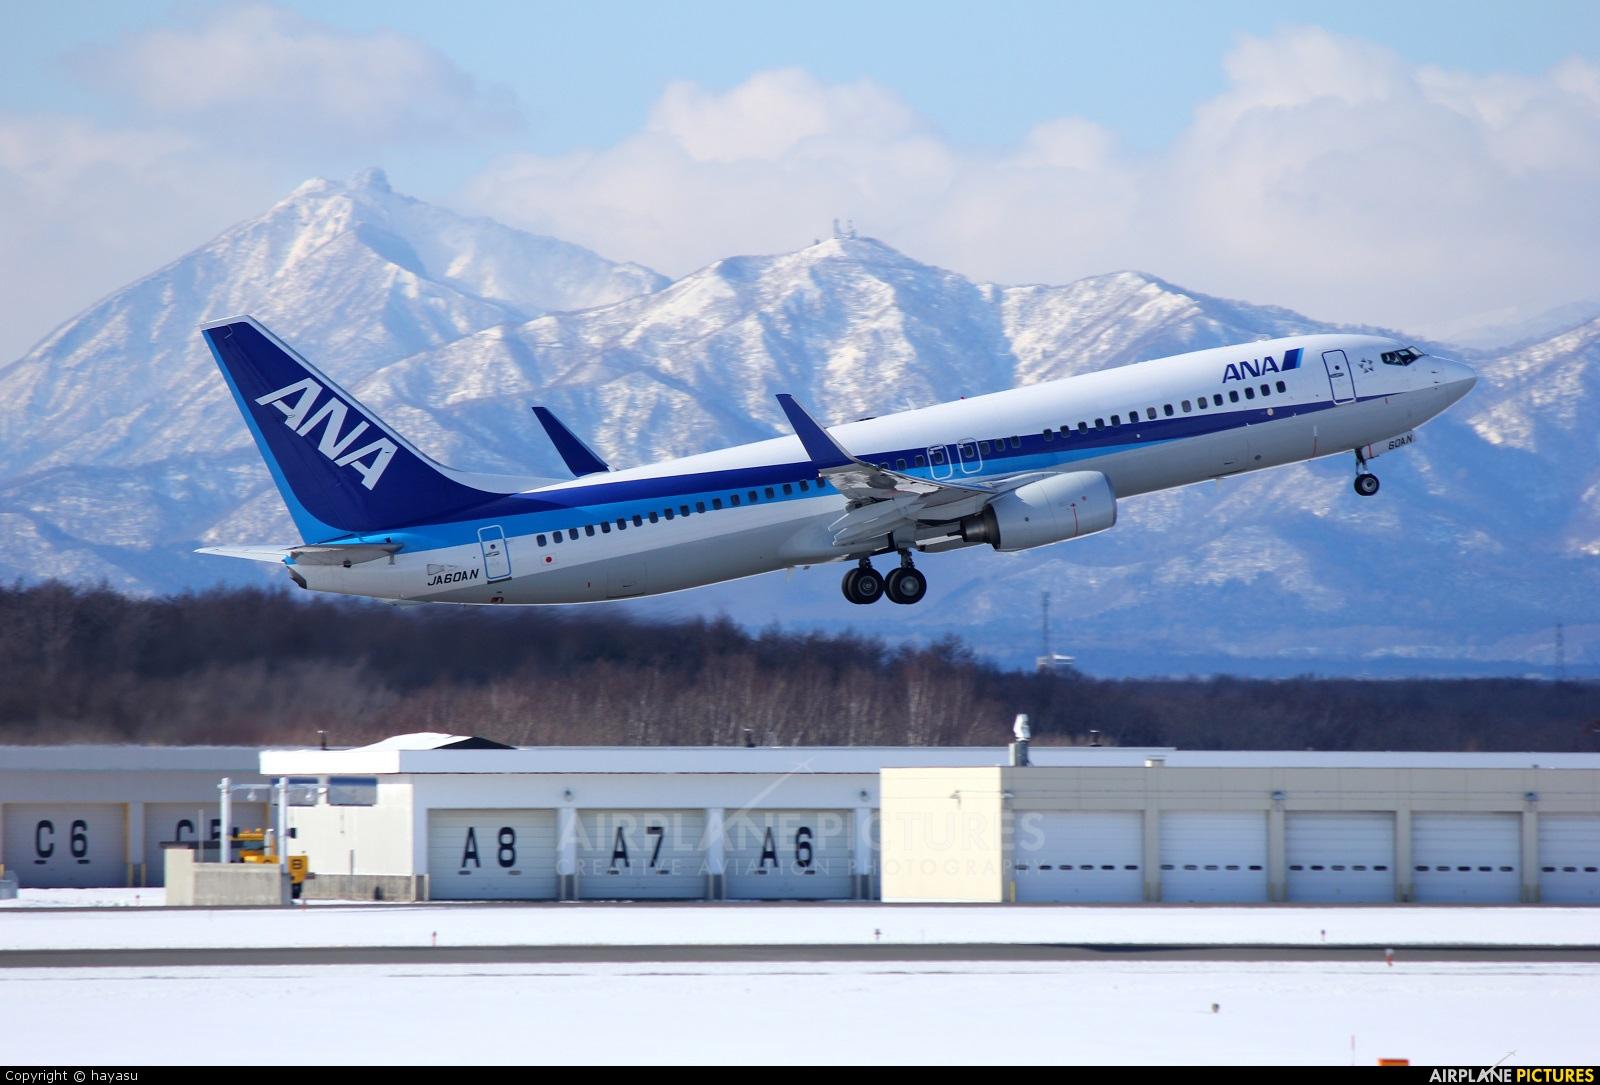 ANA - All Nippon Airways JA06AN aircraft at New Chitose